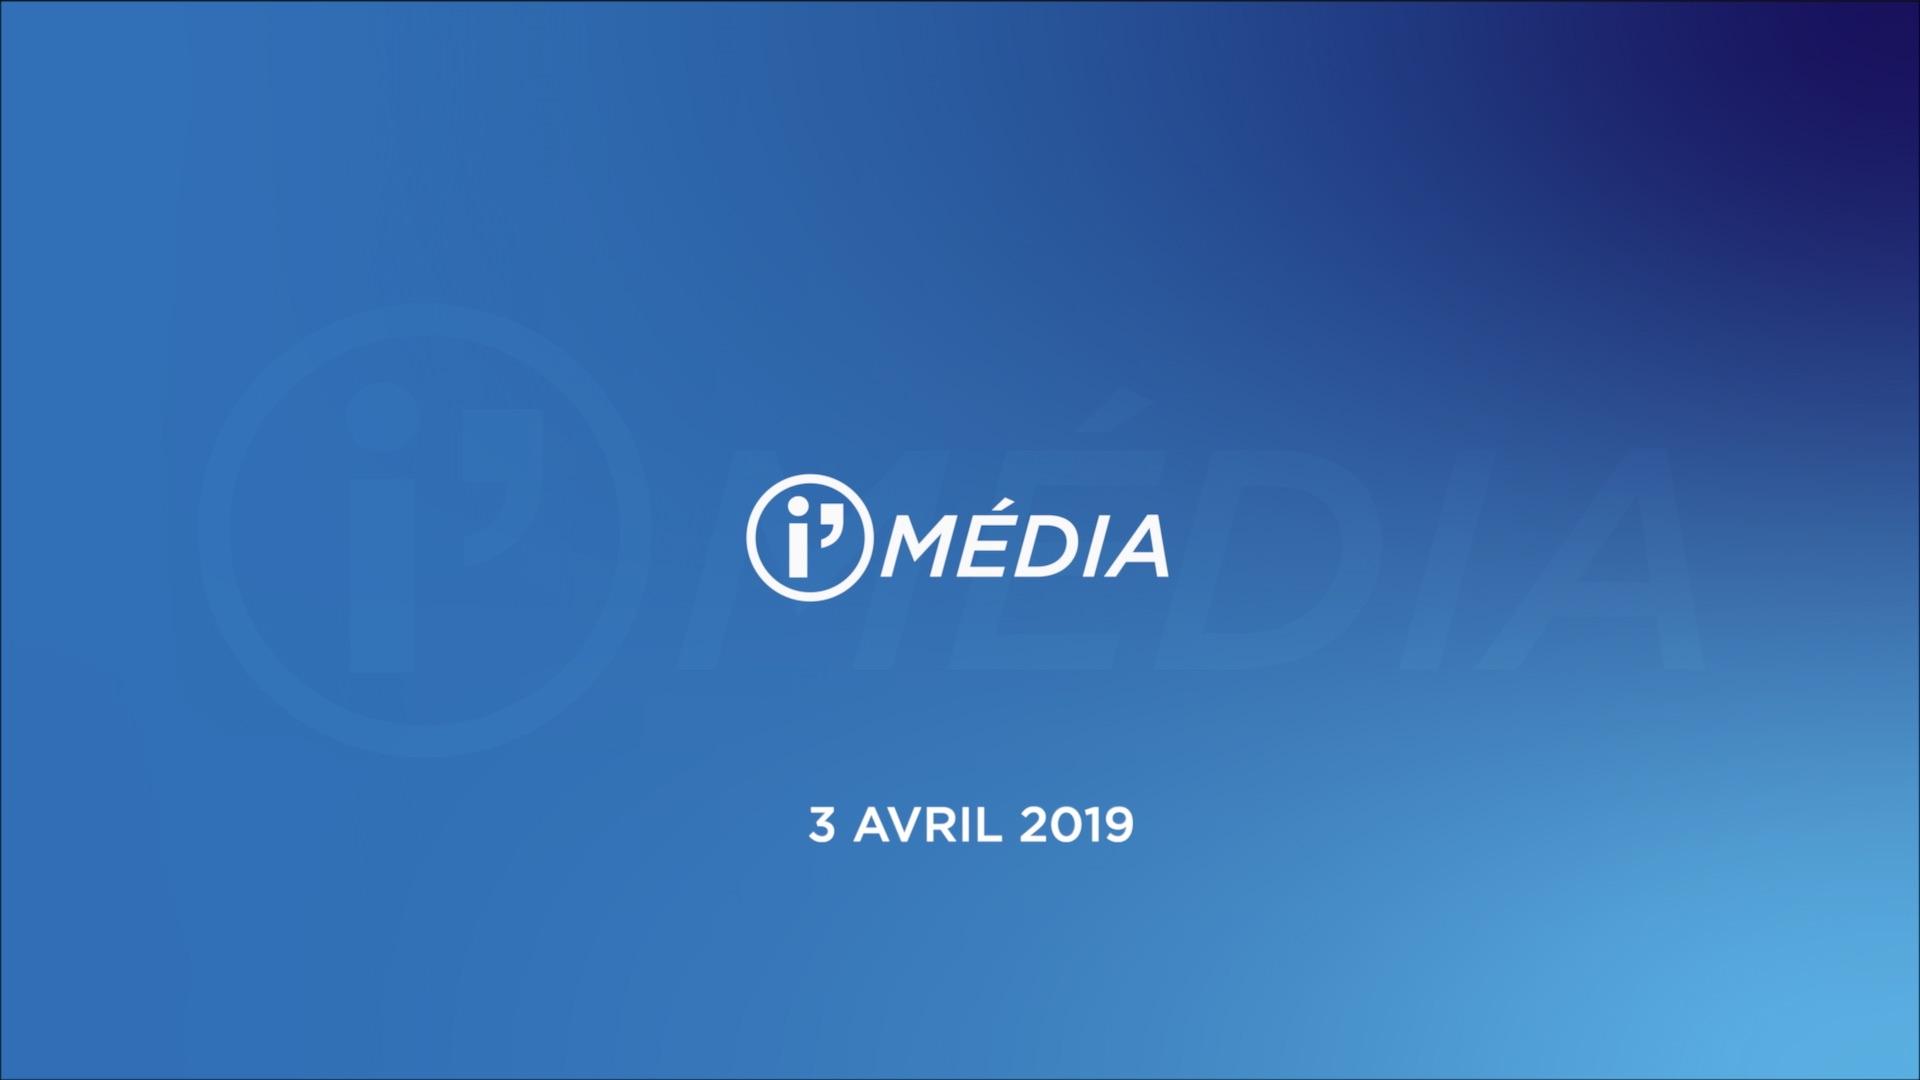 I'média 03.04.2019